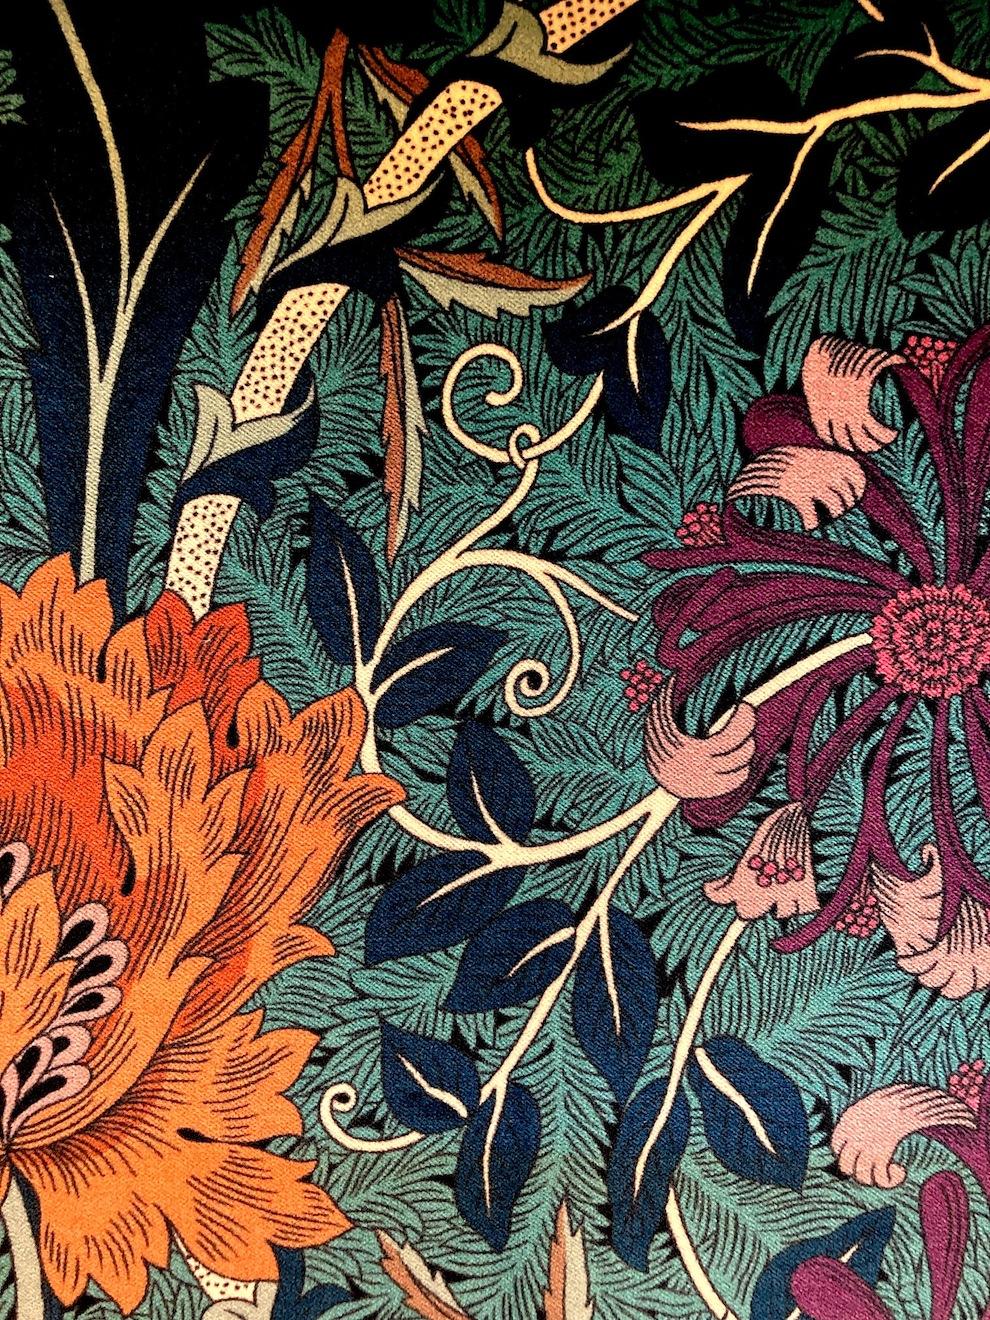 "W.モリス ベルベットプリントコレクション""Honeysuckle&Tulip Velvet236940 133cmx1m以上10cm単位でカット販売 (海外取寄せ)"